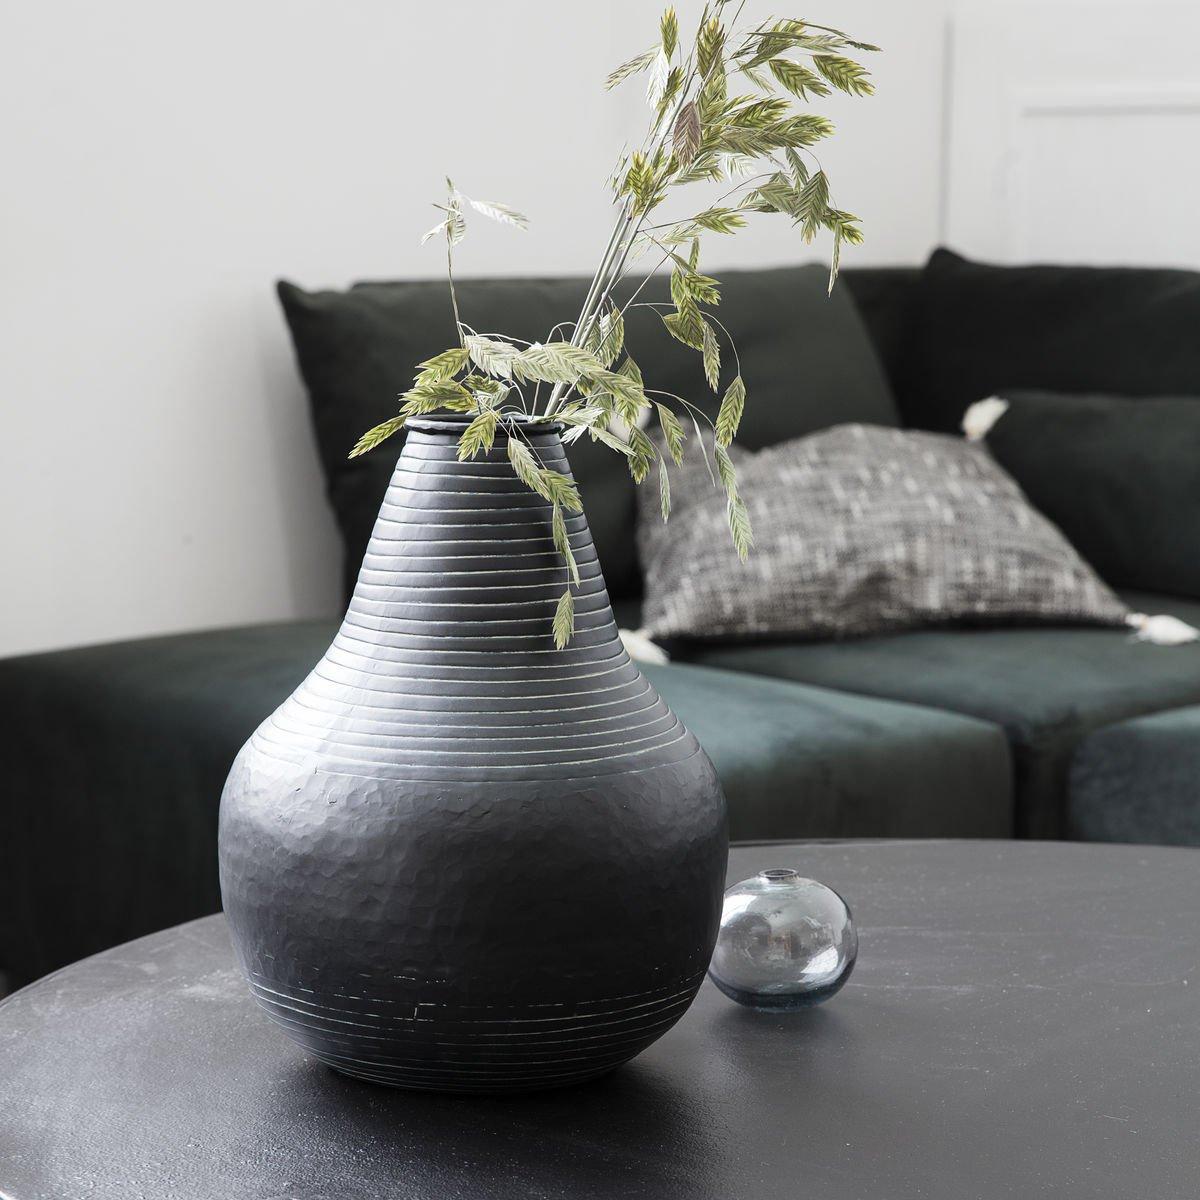 Sada 2 ks – Černá váza stříb